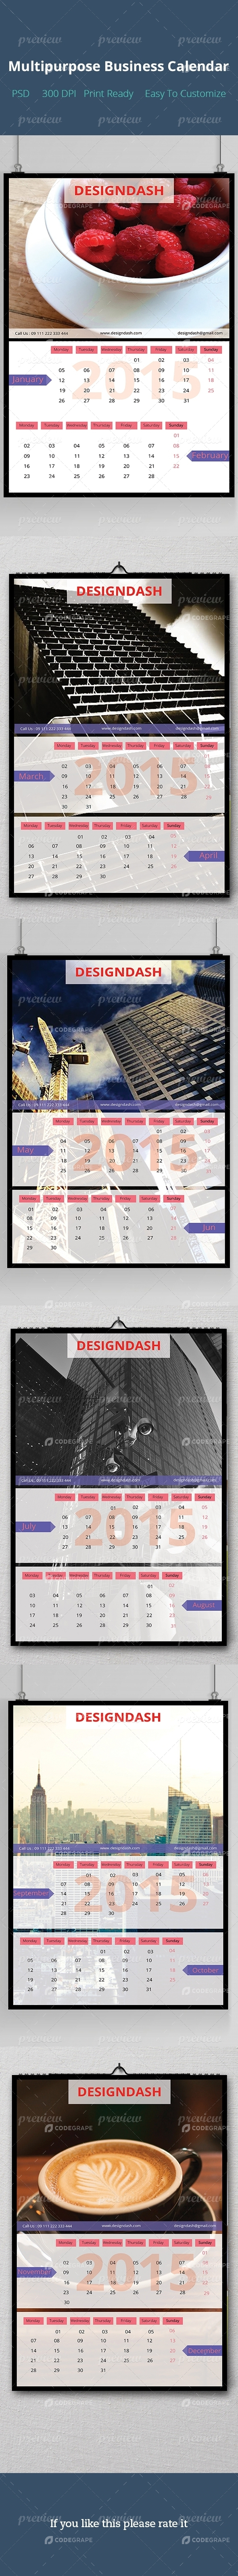 Multipurpose Business Calendar Design